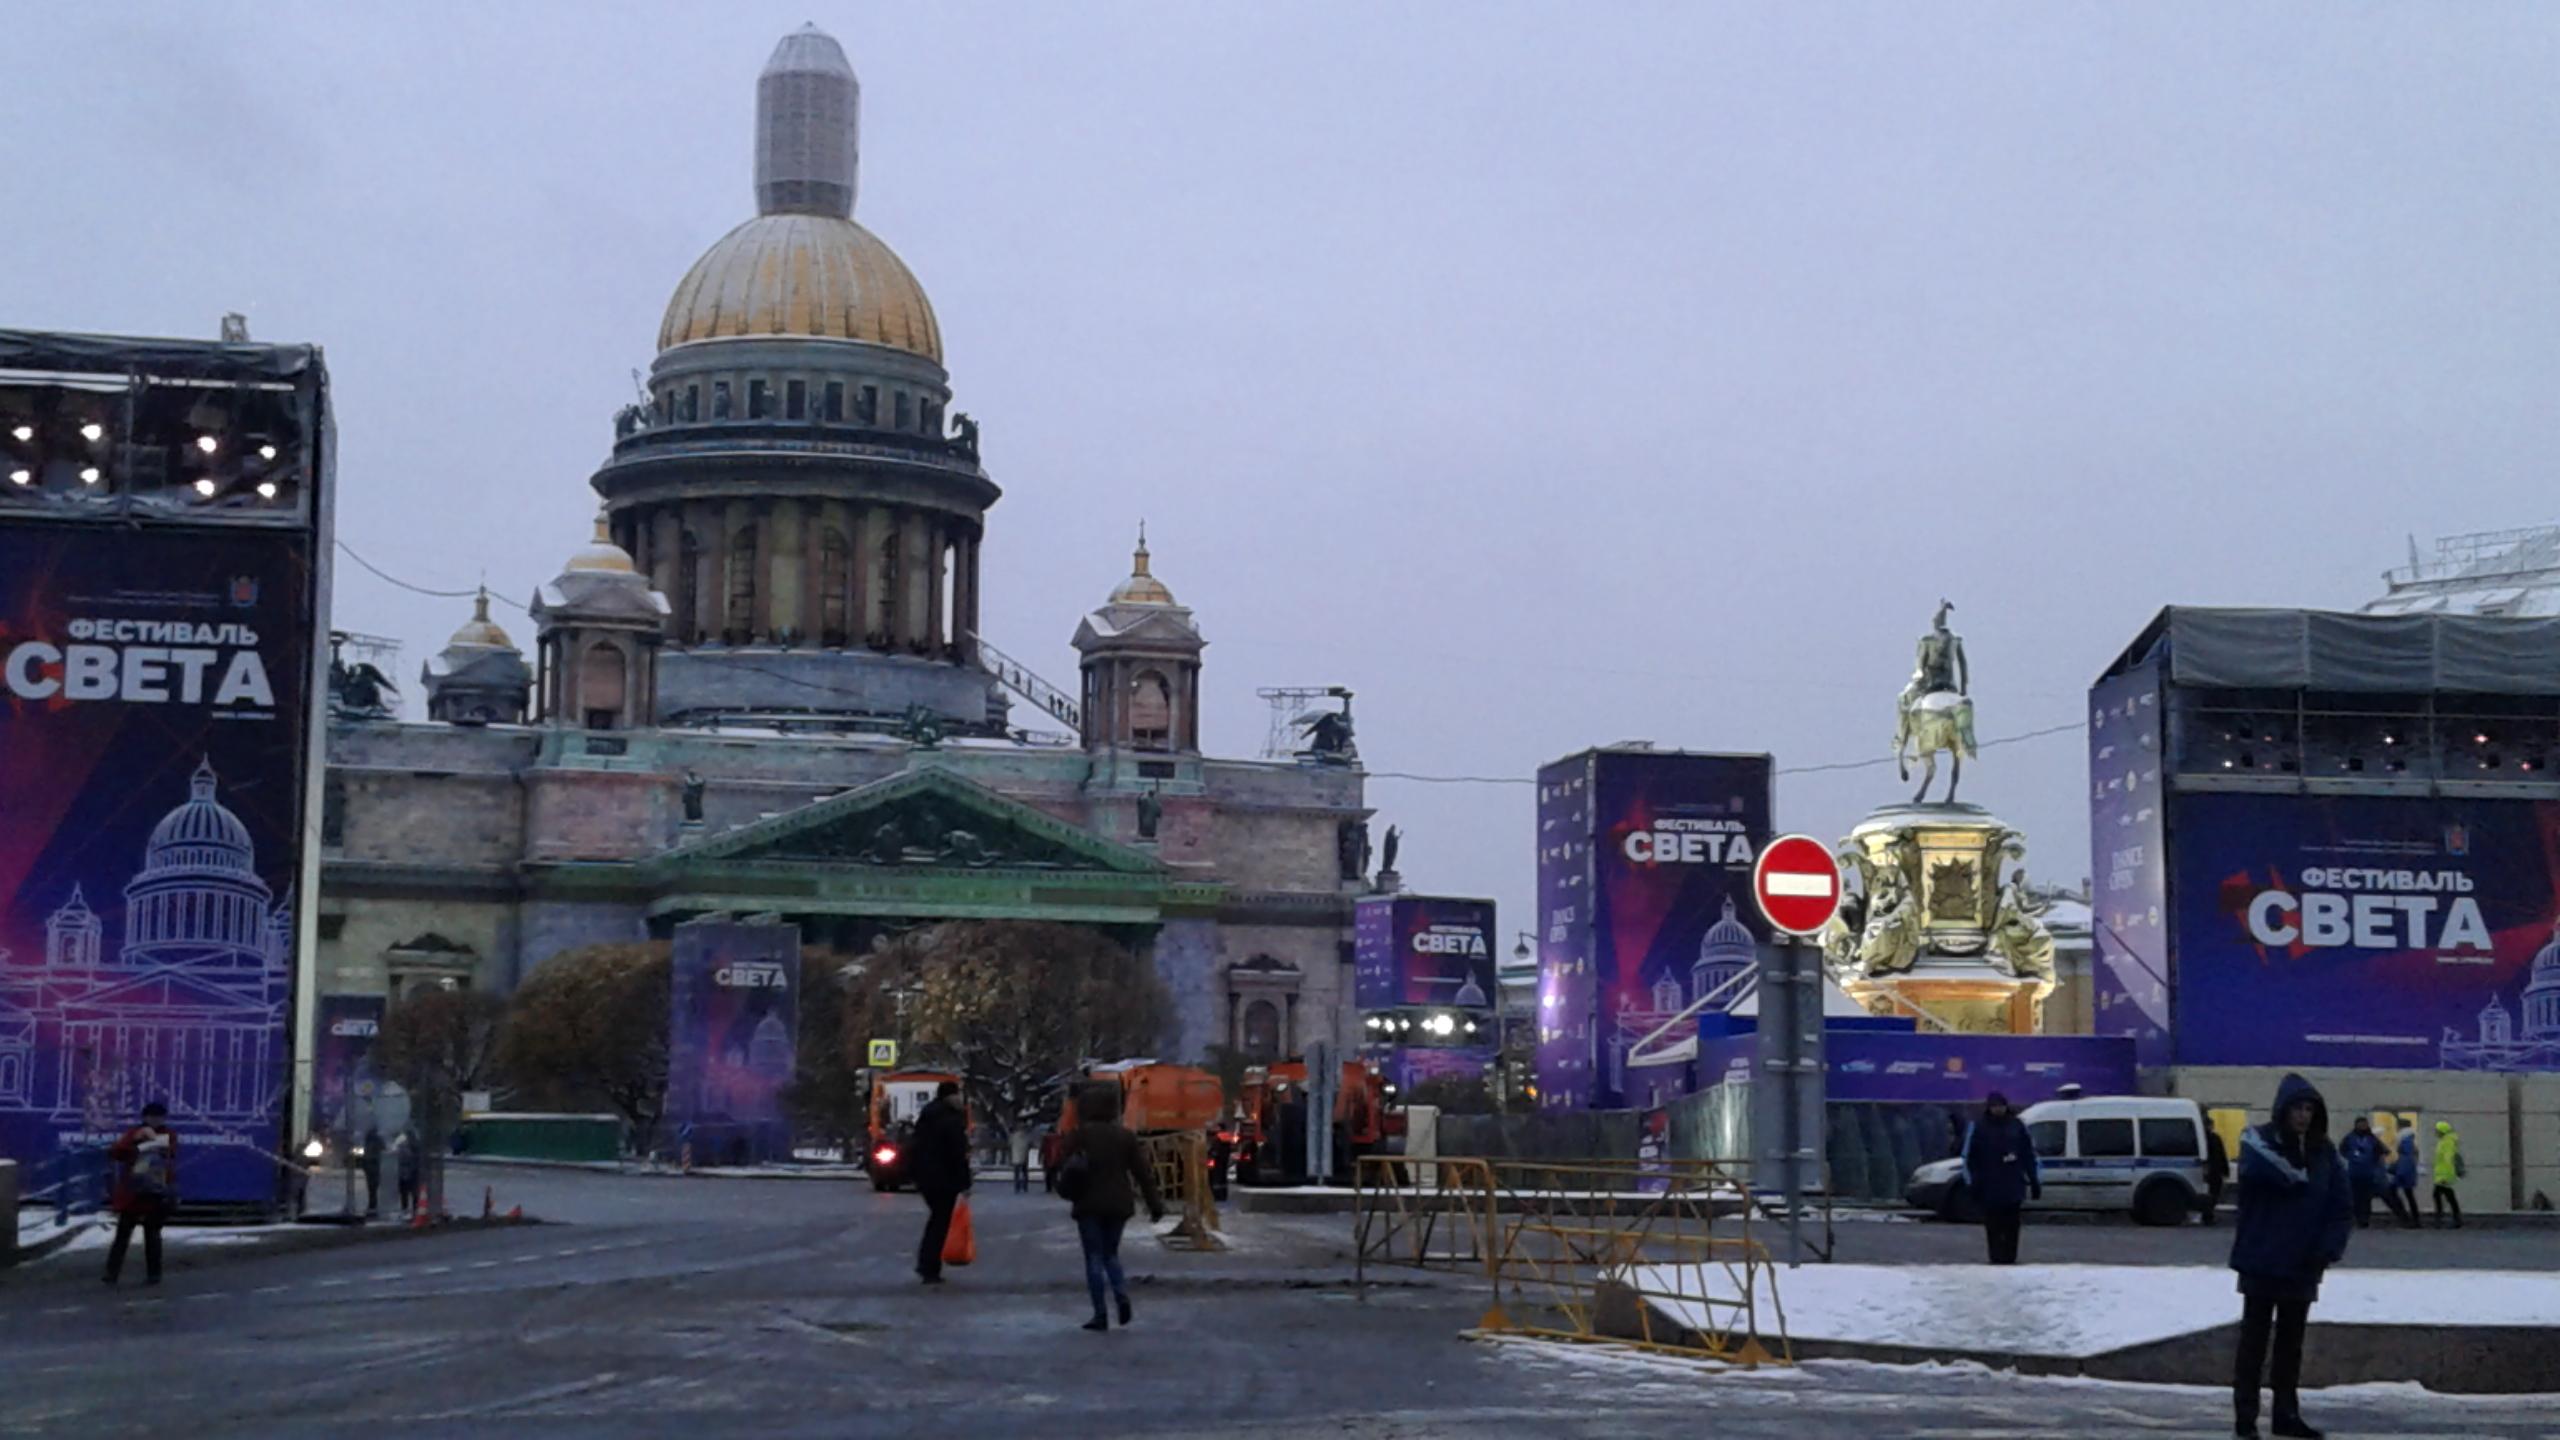 Санкт-Петербург. Фестиваль света 2016